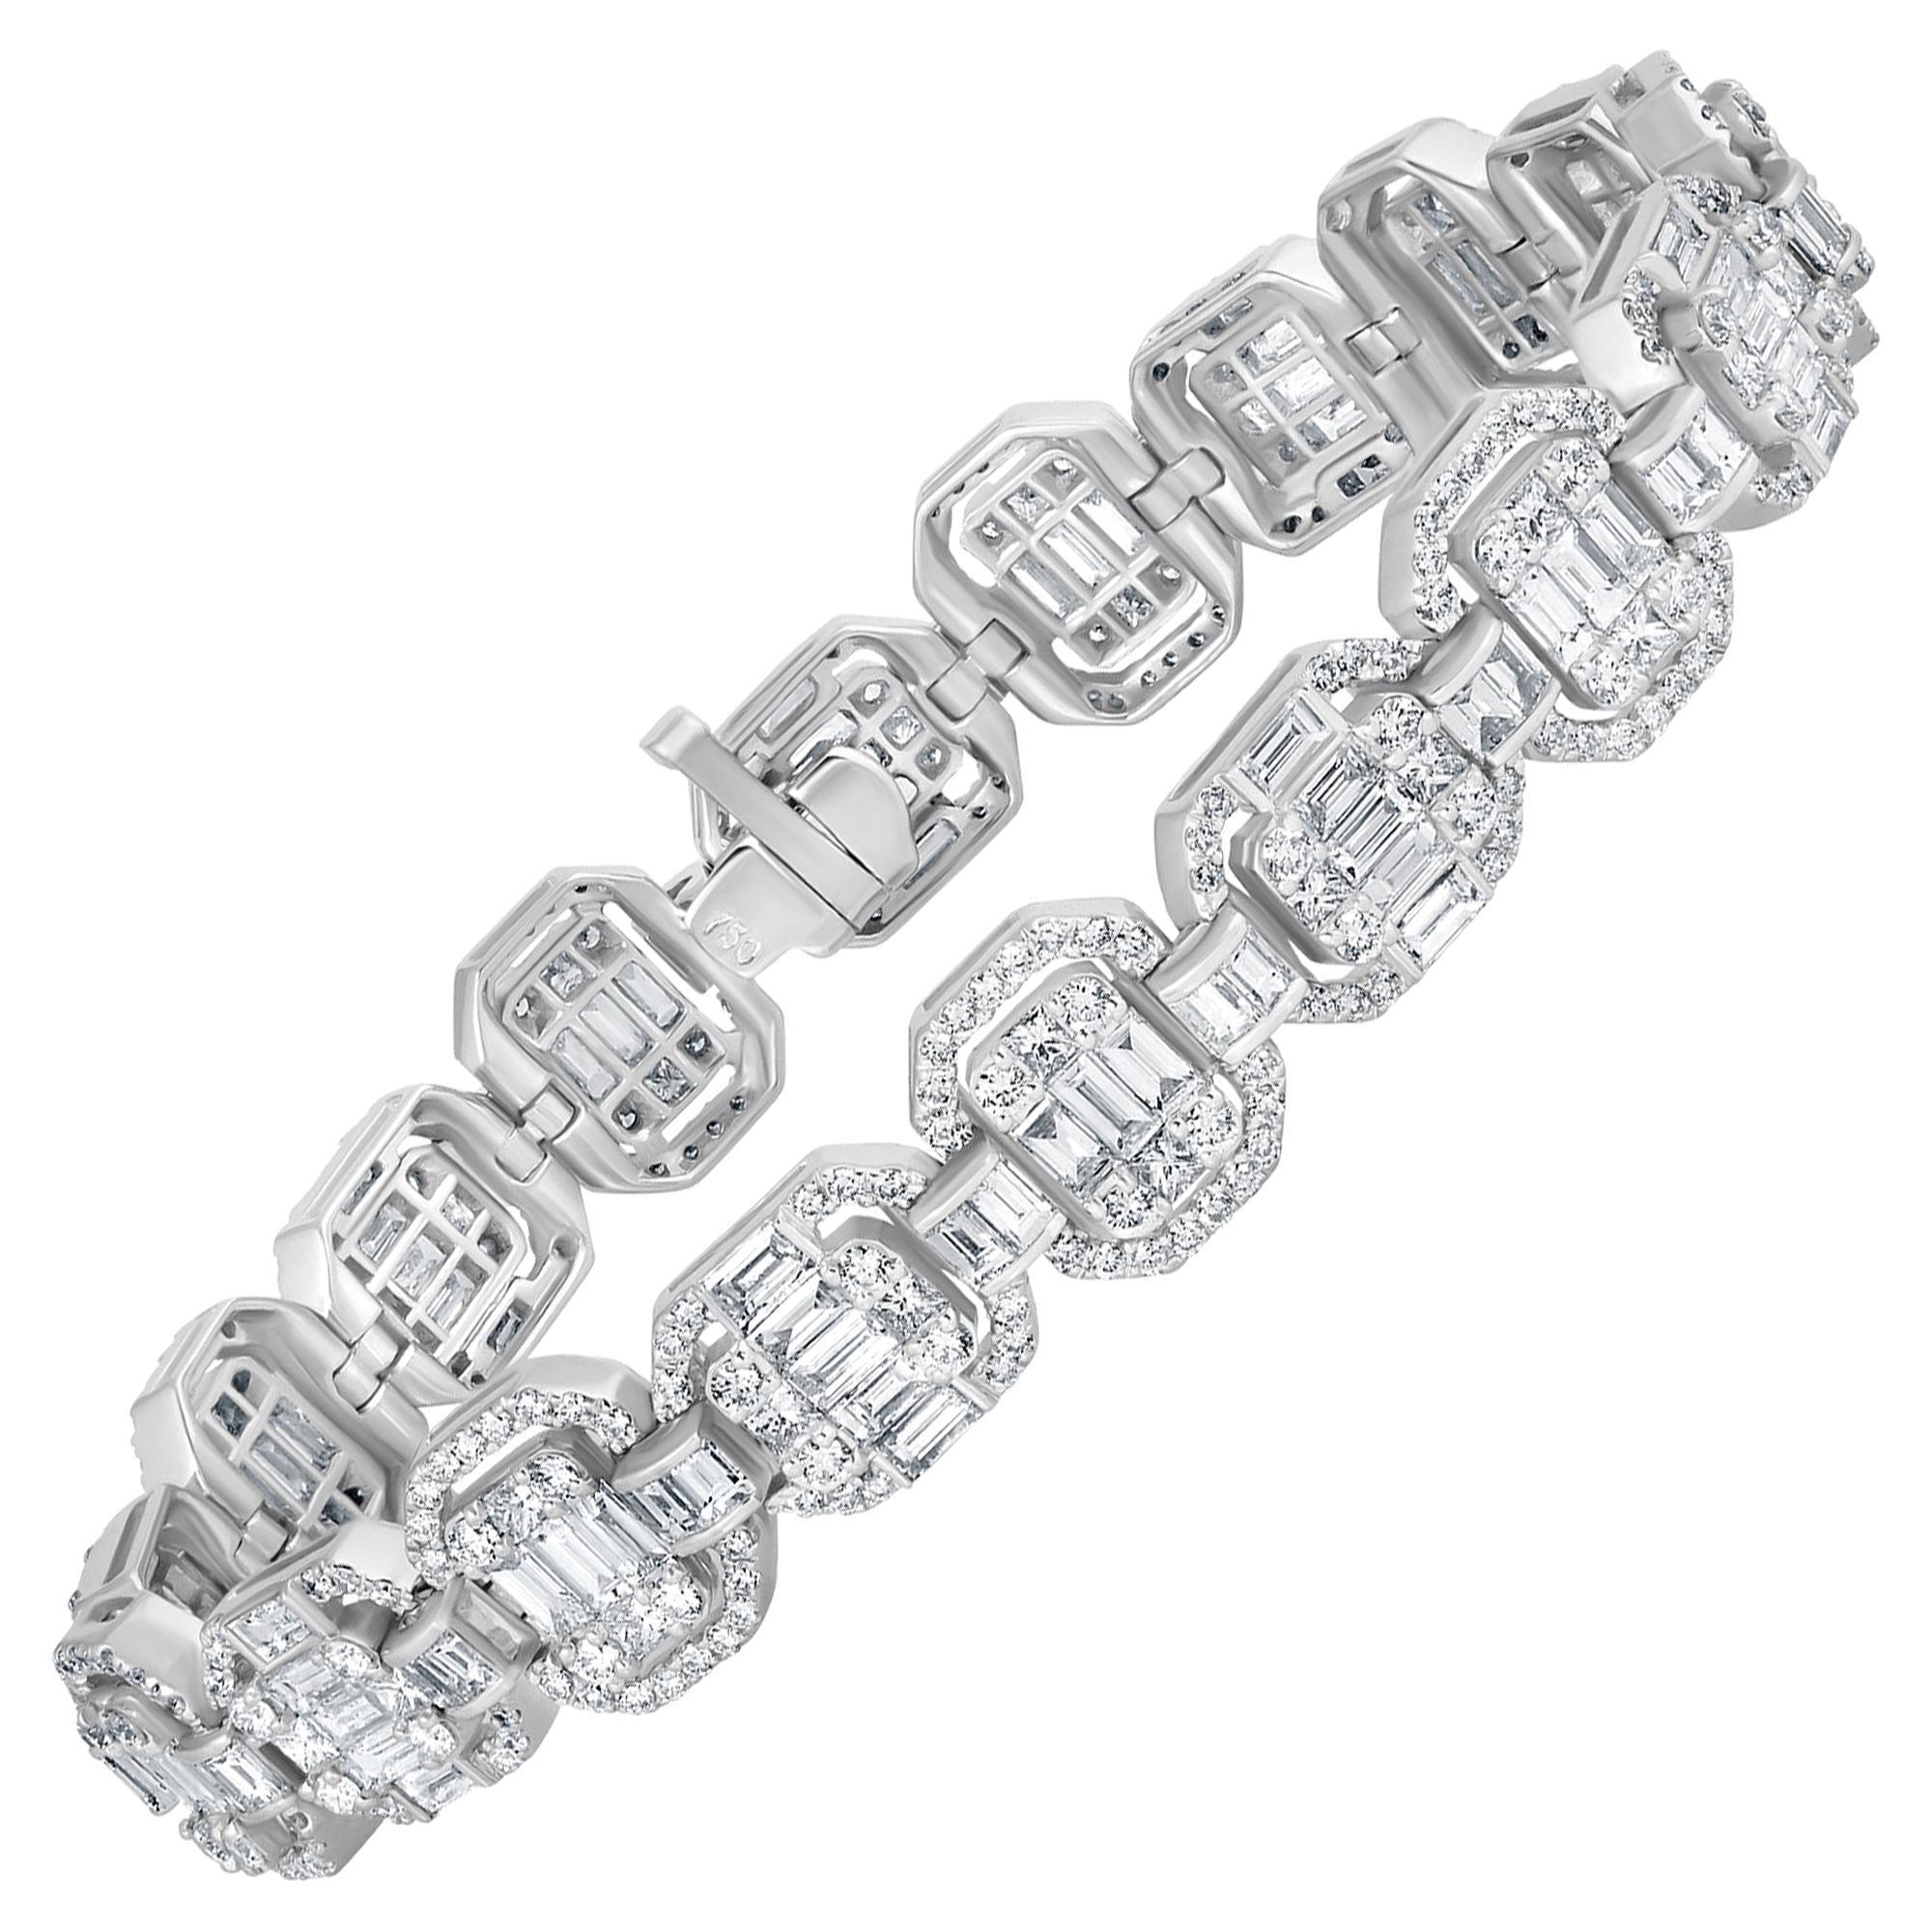 Emilio Jewelry 9.49 Carat Diamond Bracelet